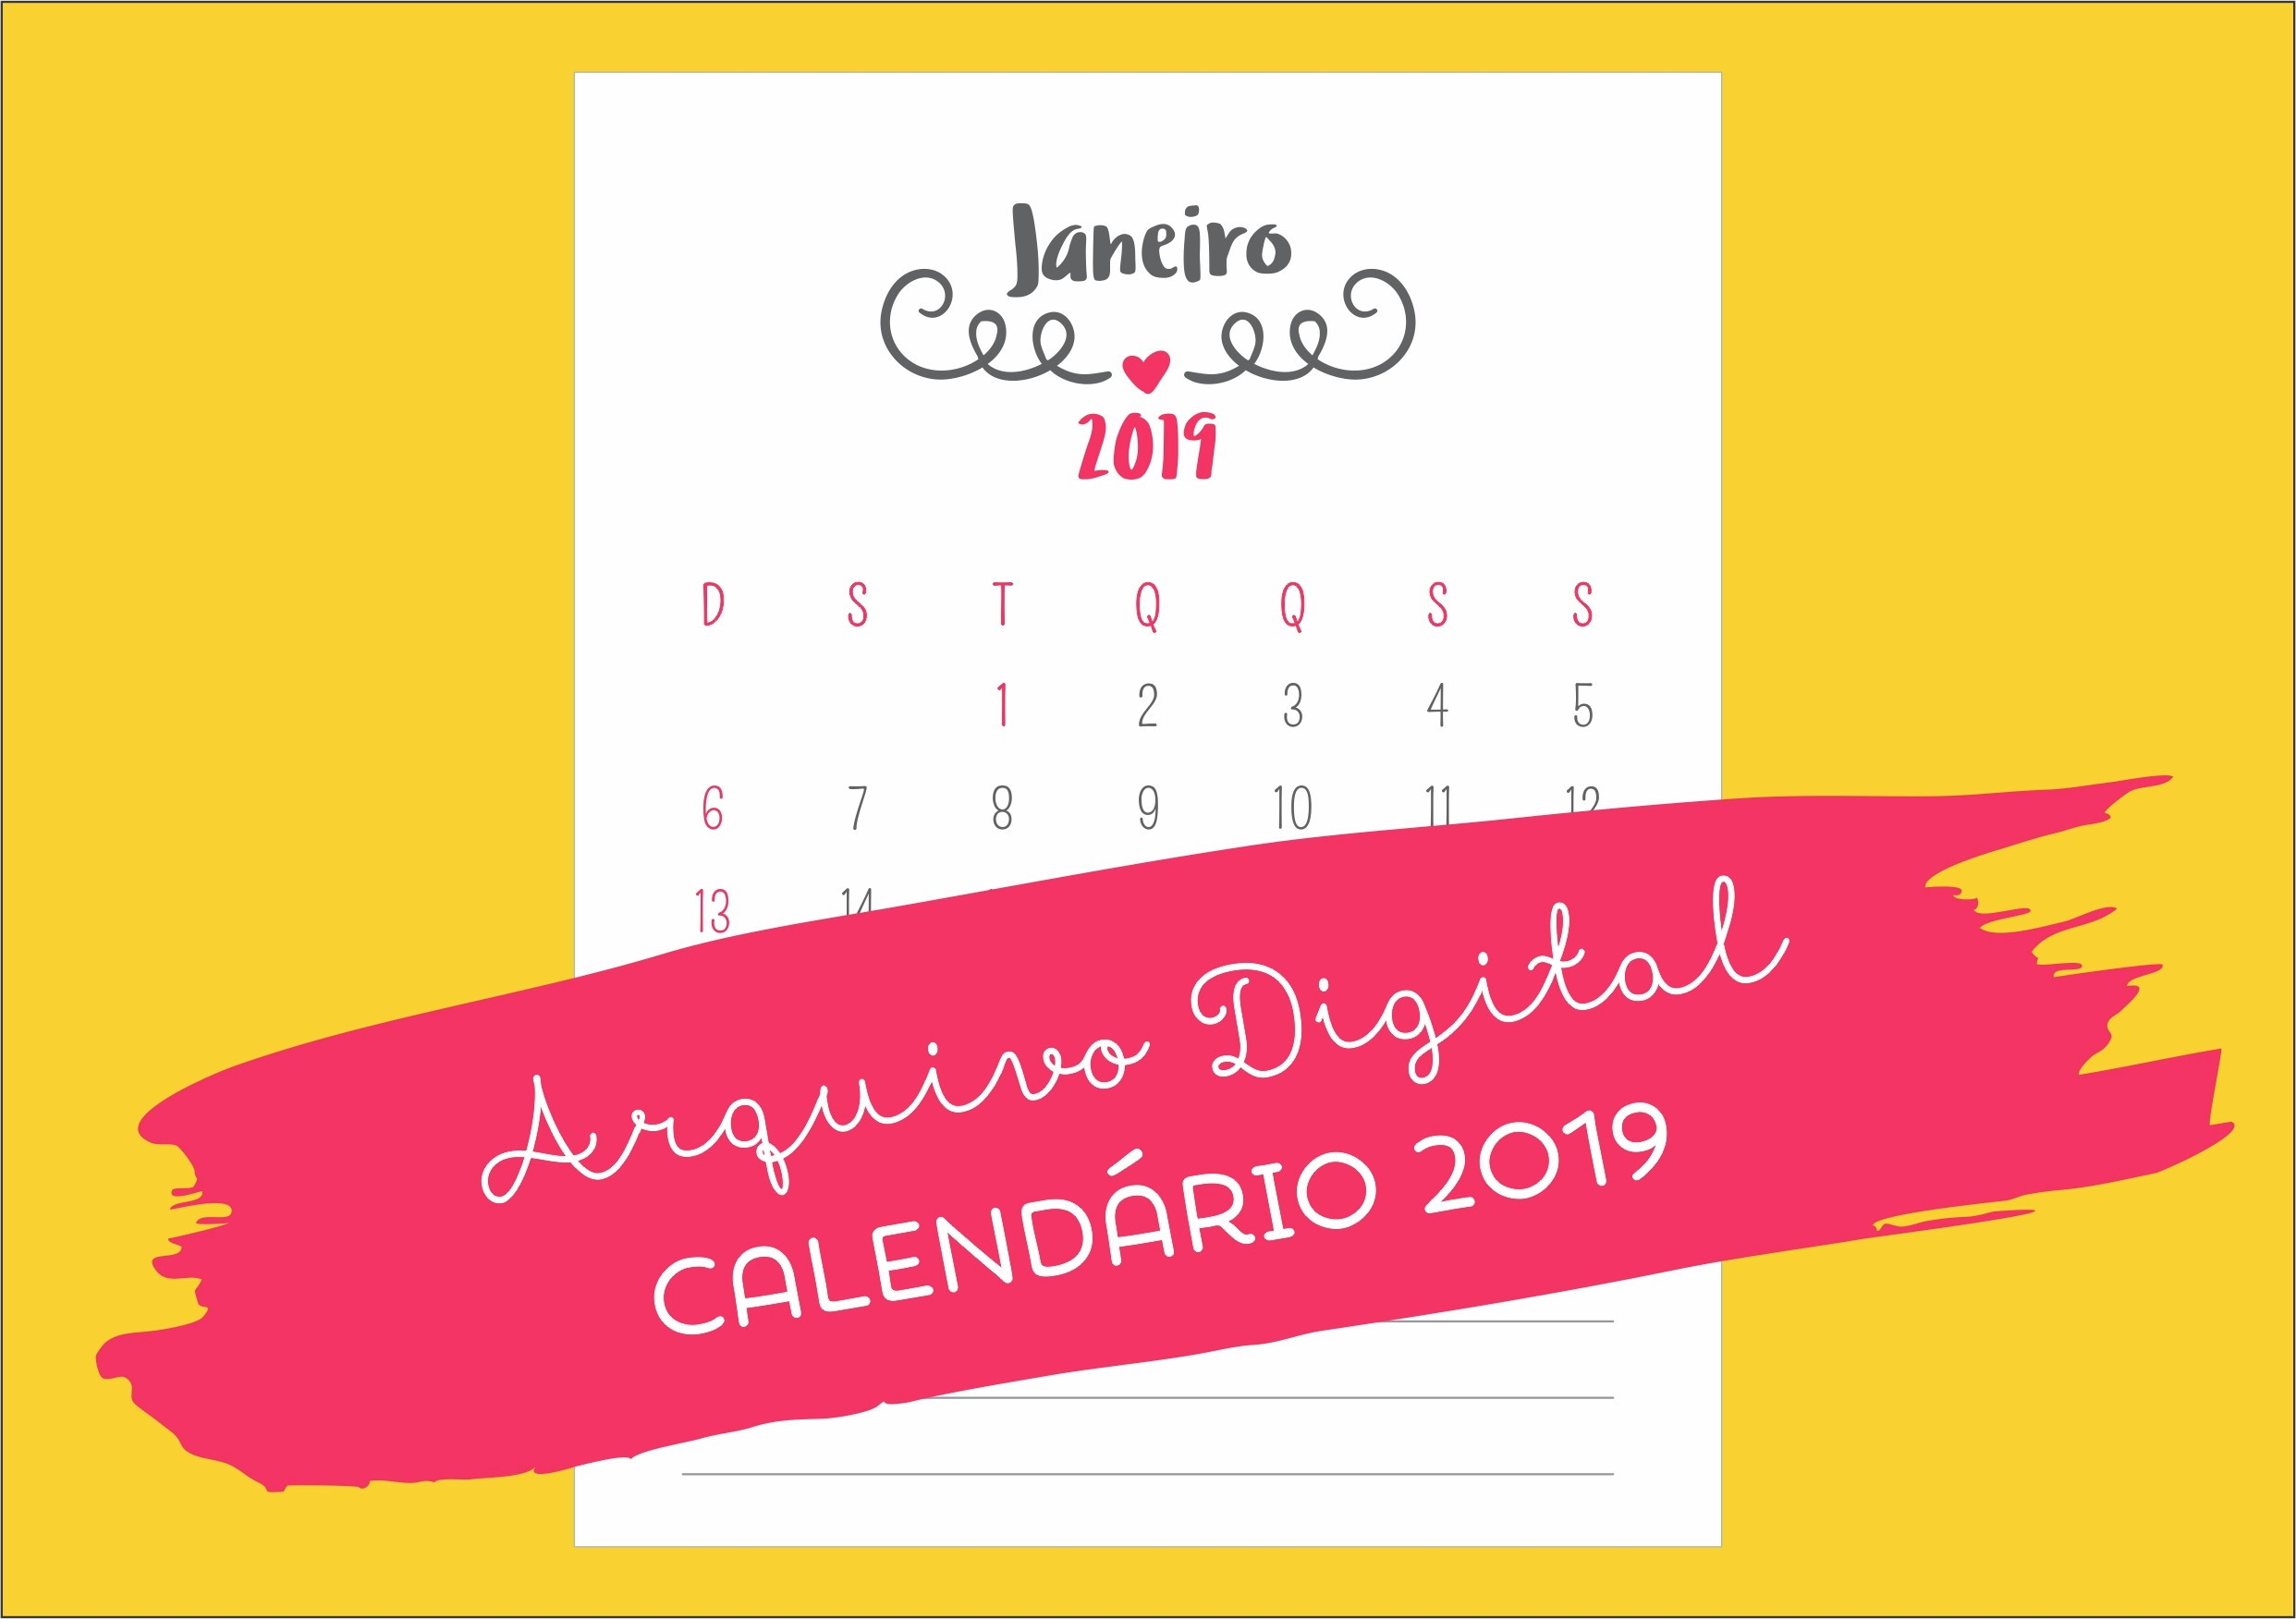 Calendario 2019 Feriados De Carnaval Más Recientes Calendários 2019 Of Calendario 2019 Feriados De Carnaval Más Reciente Calendar 2019 Kuda Malaysia Vbs Volunteer Sign Up Sheet Template